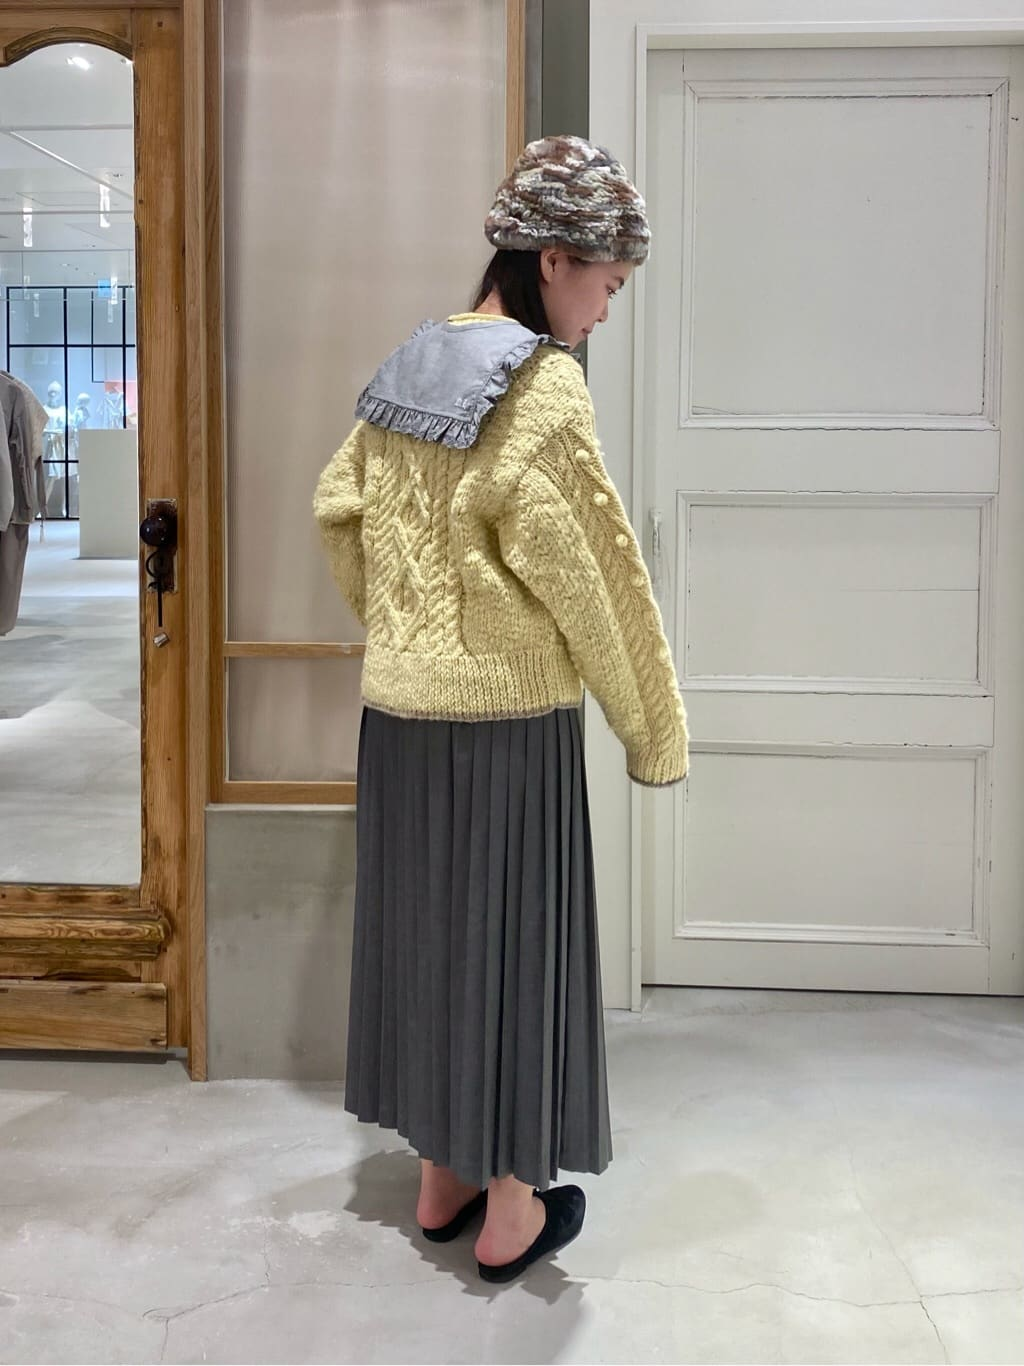 bulle de savon 渋谷スクランブルスクエア 身長:158cm 2021.09.16